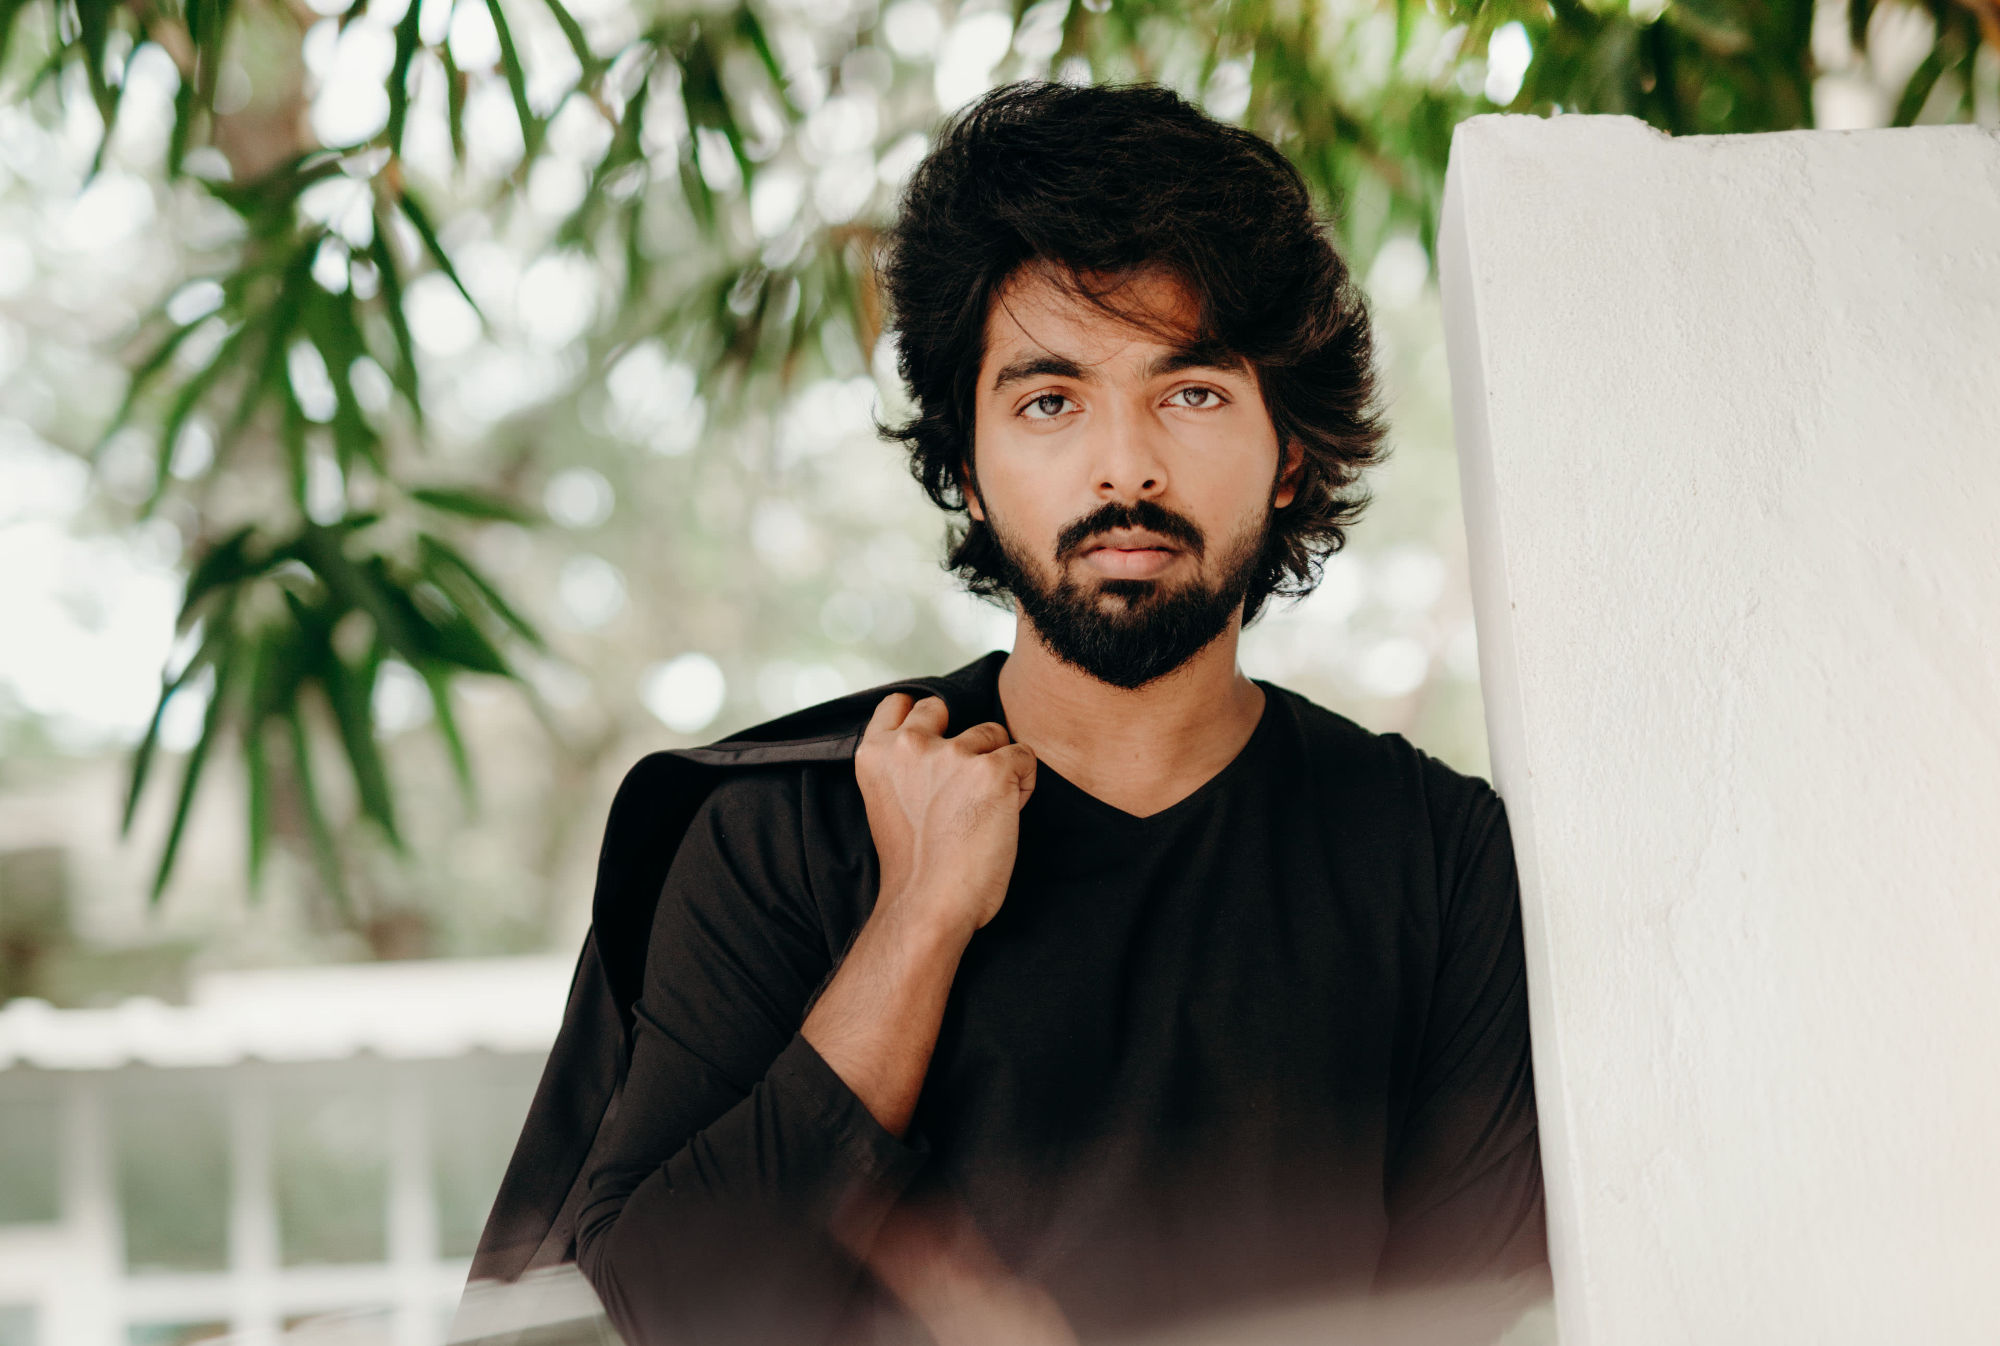 Music Director GV Prakash to auction songs on Binance app